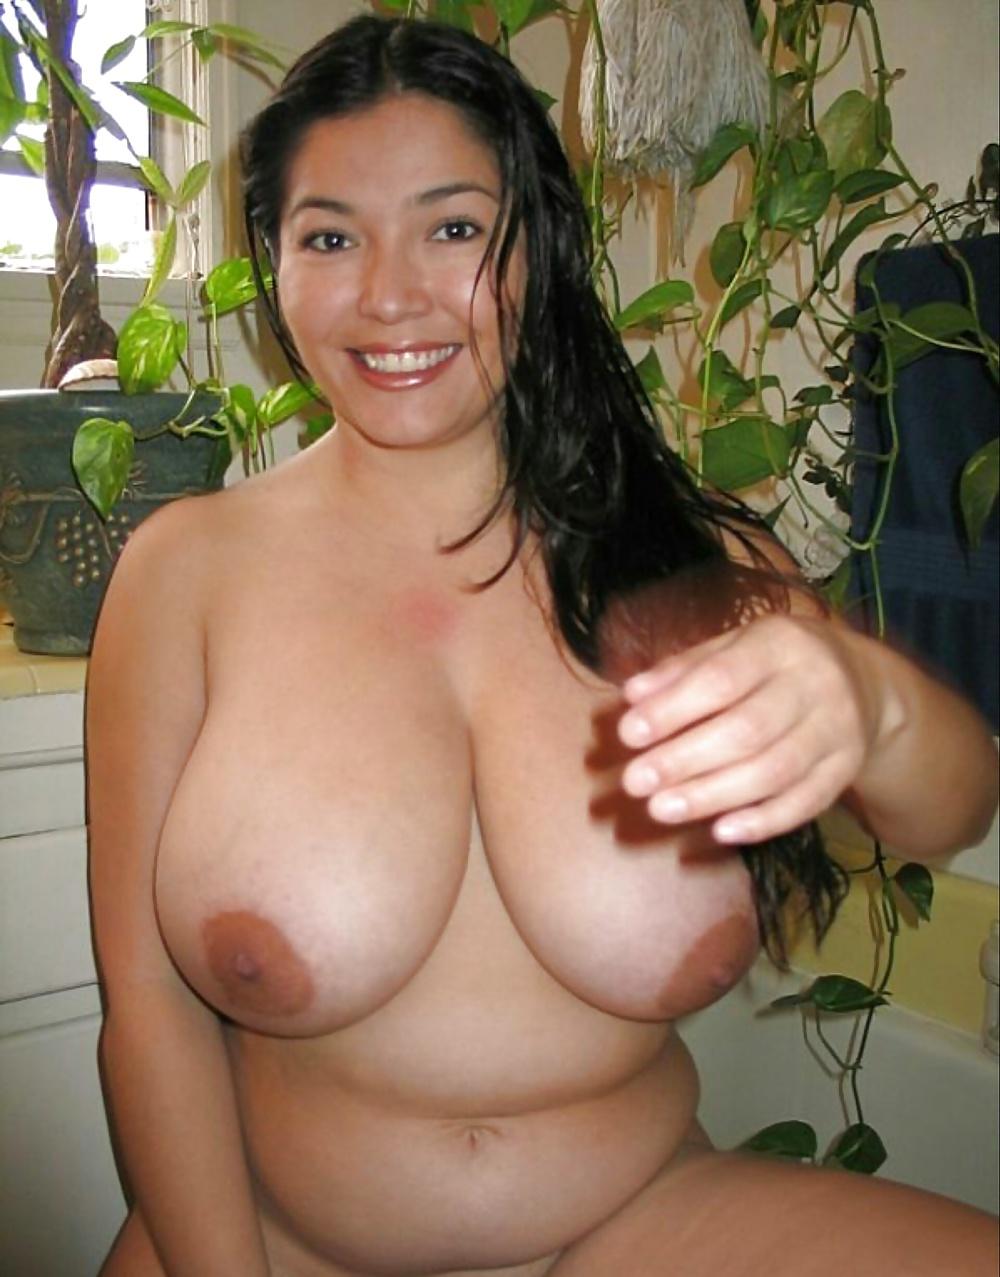 Big tits mongolian, hot nerdy girls toples